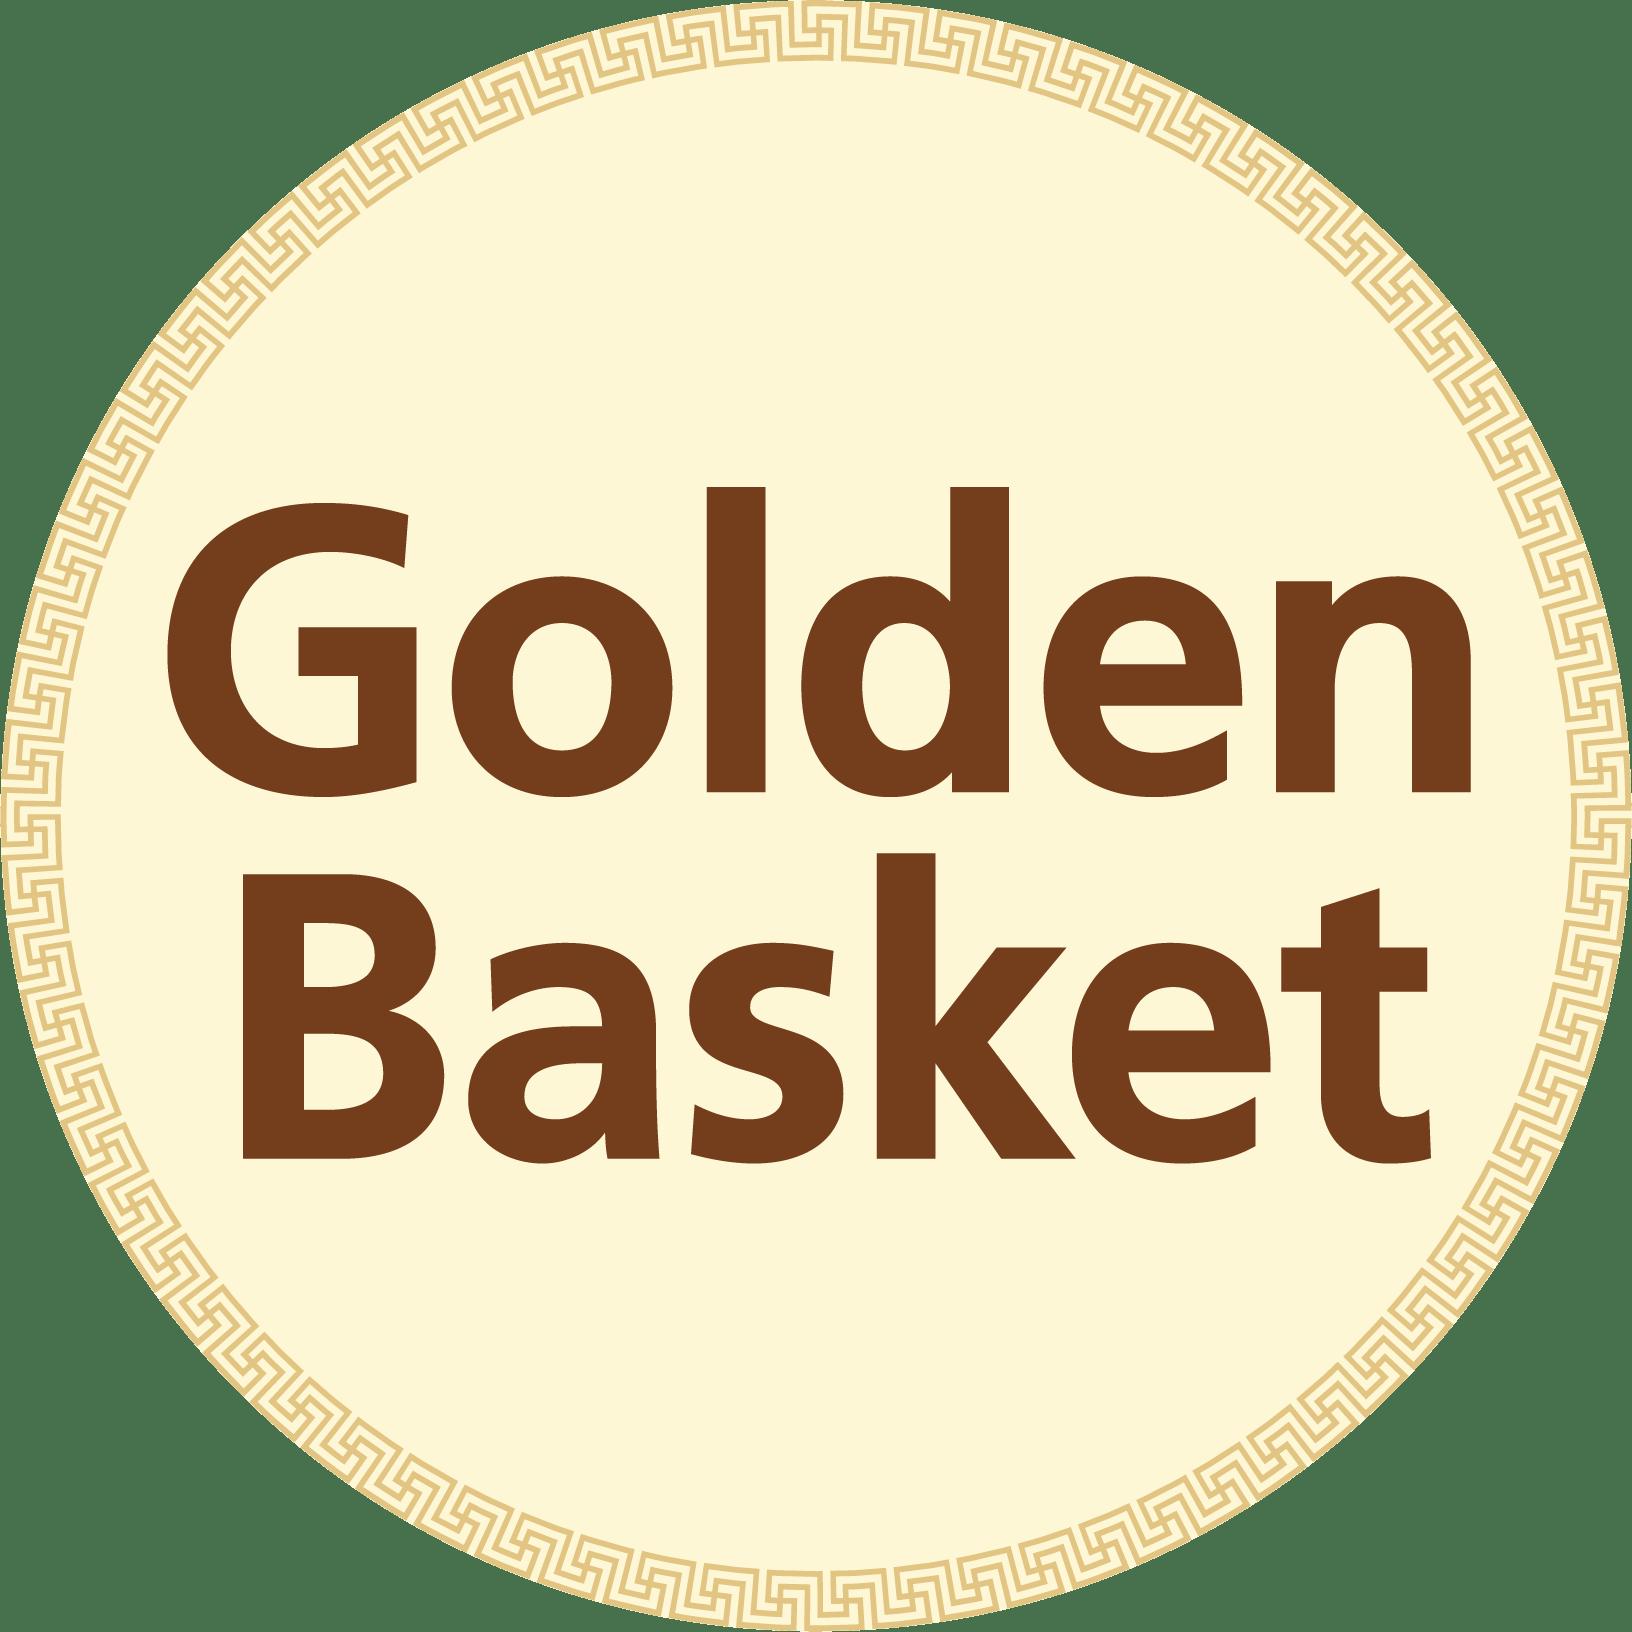 Golden Basket Restaurant Menu and Delivery in Green Bay WI, 54304